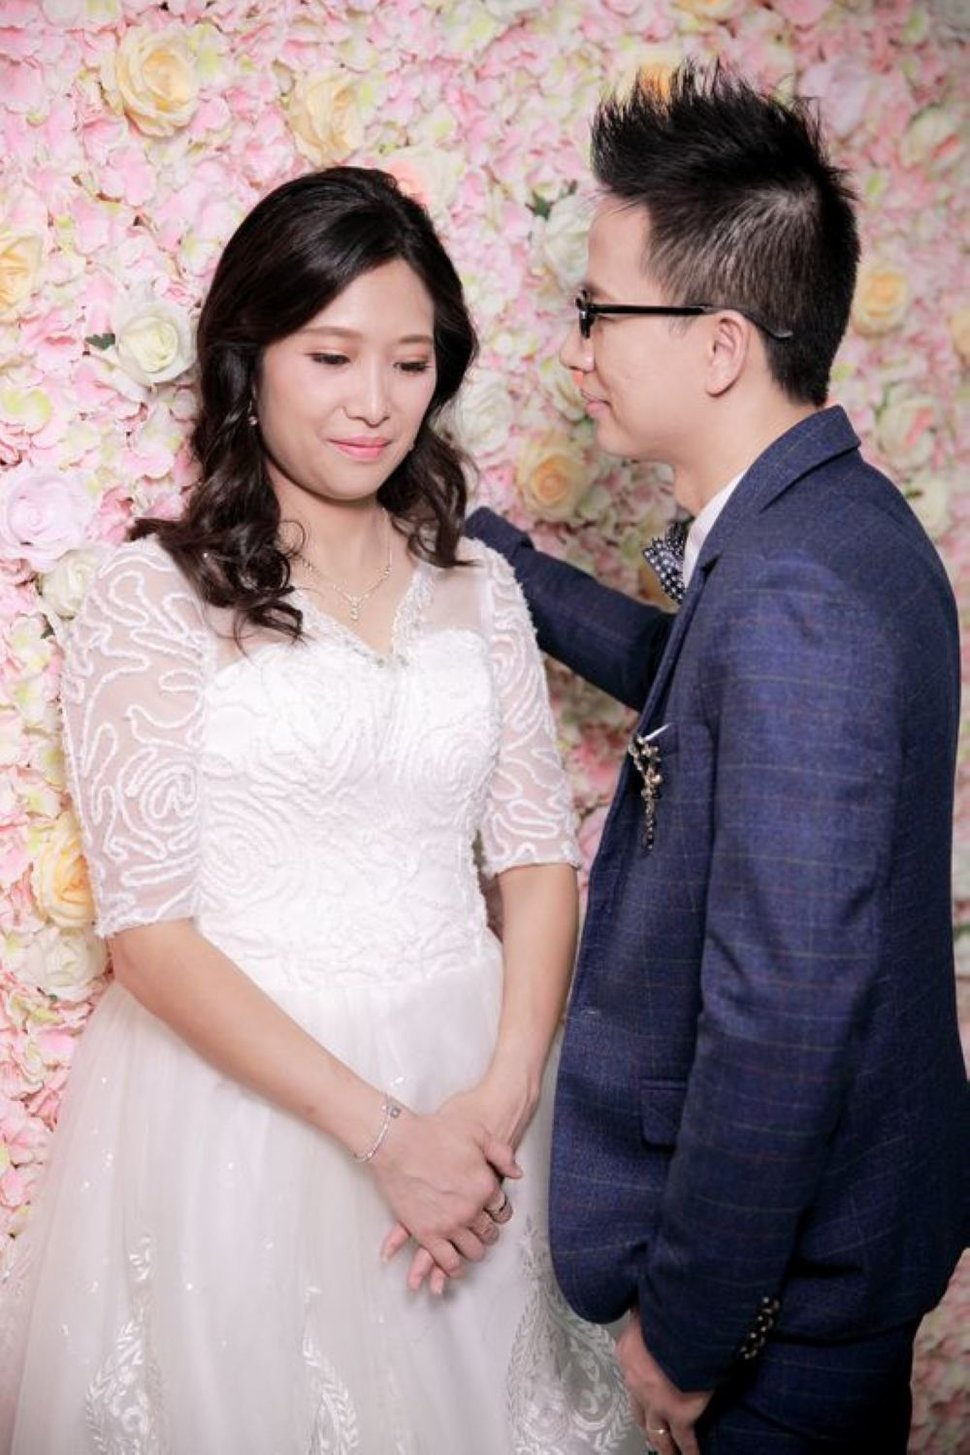 nEO_IMG_BOBO2795 - 全台最便宜-45DESIGN四五婚紗禮服《結婚吧》